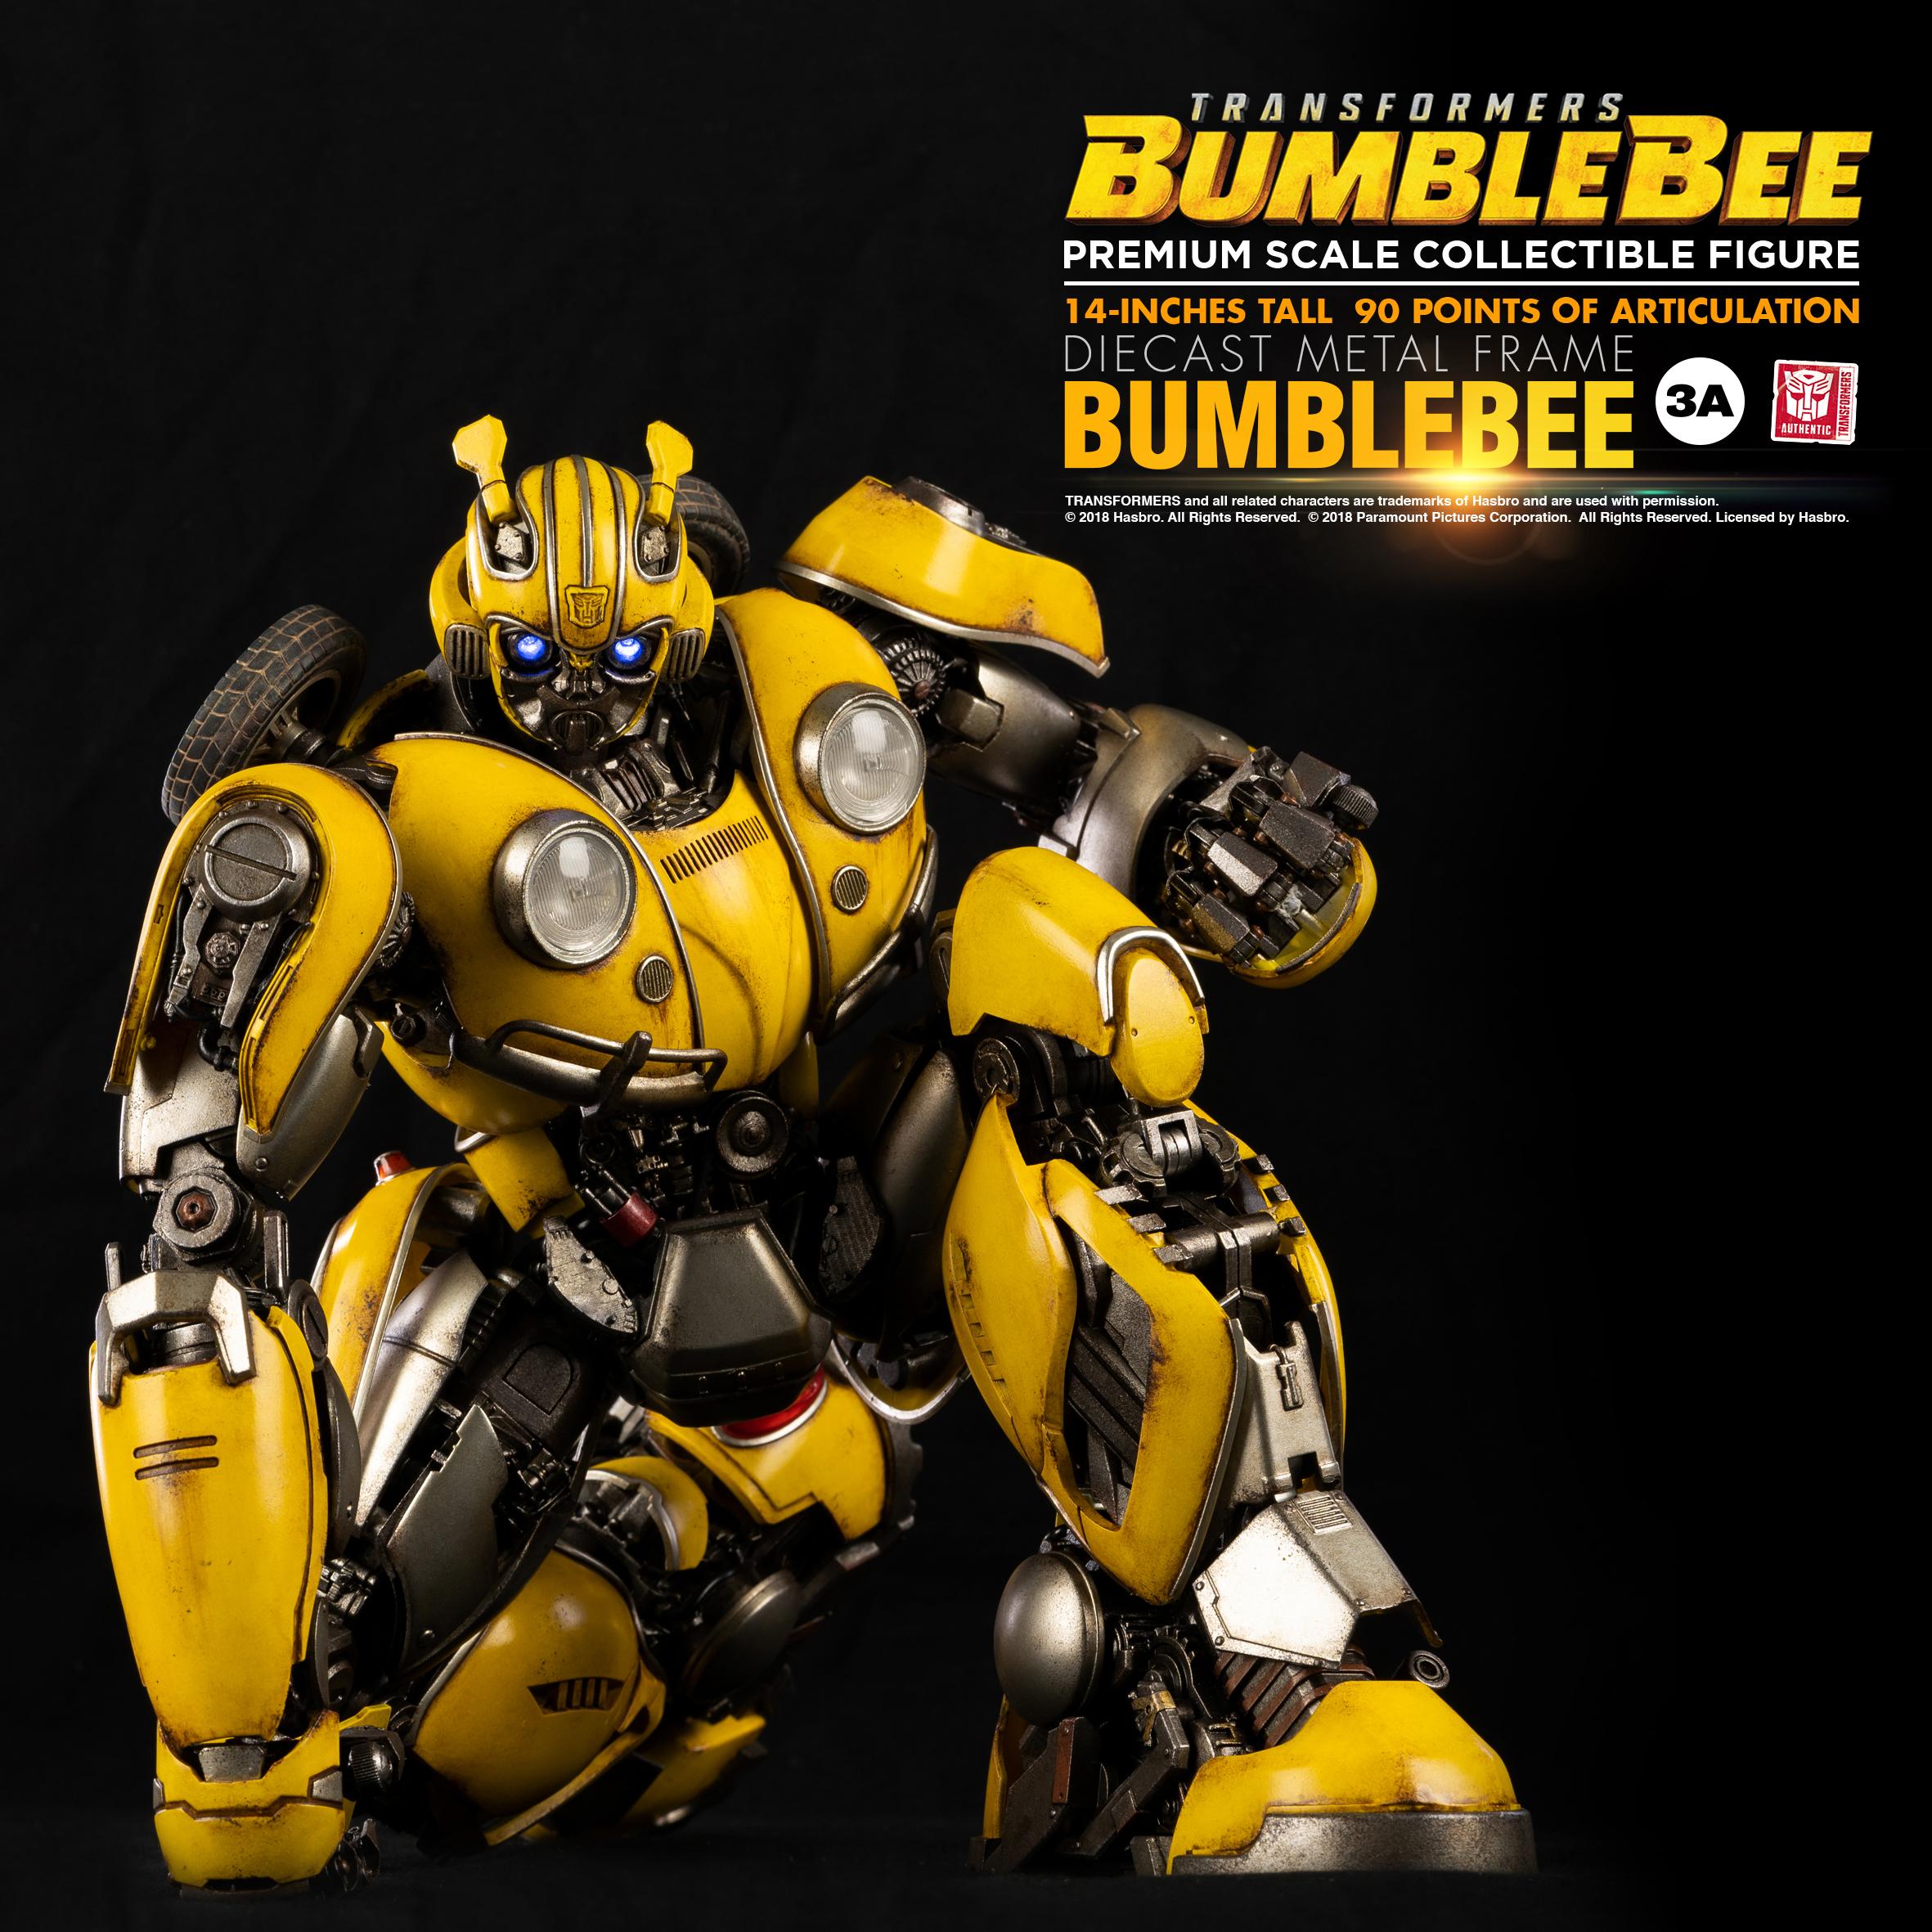 Bumblebee_ENG_PM_SQUARE_010.jpg